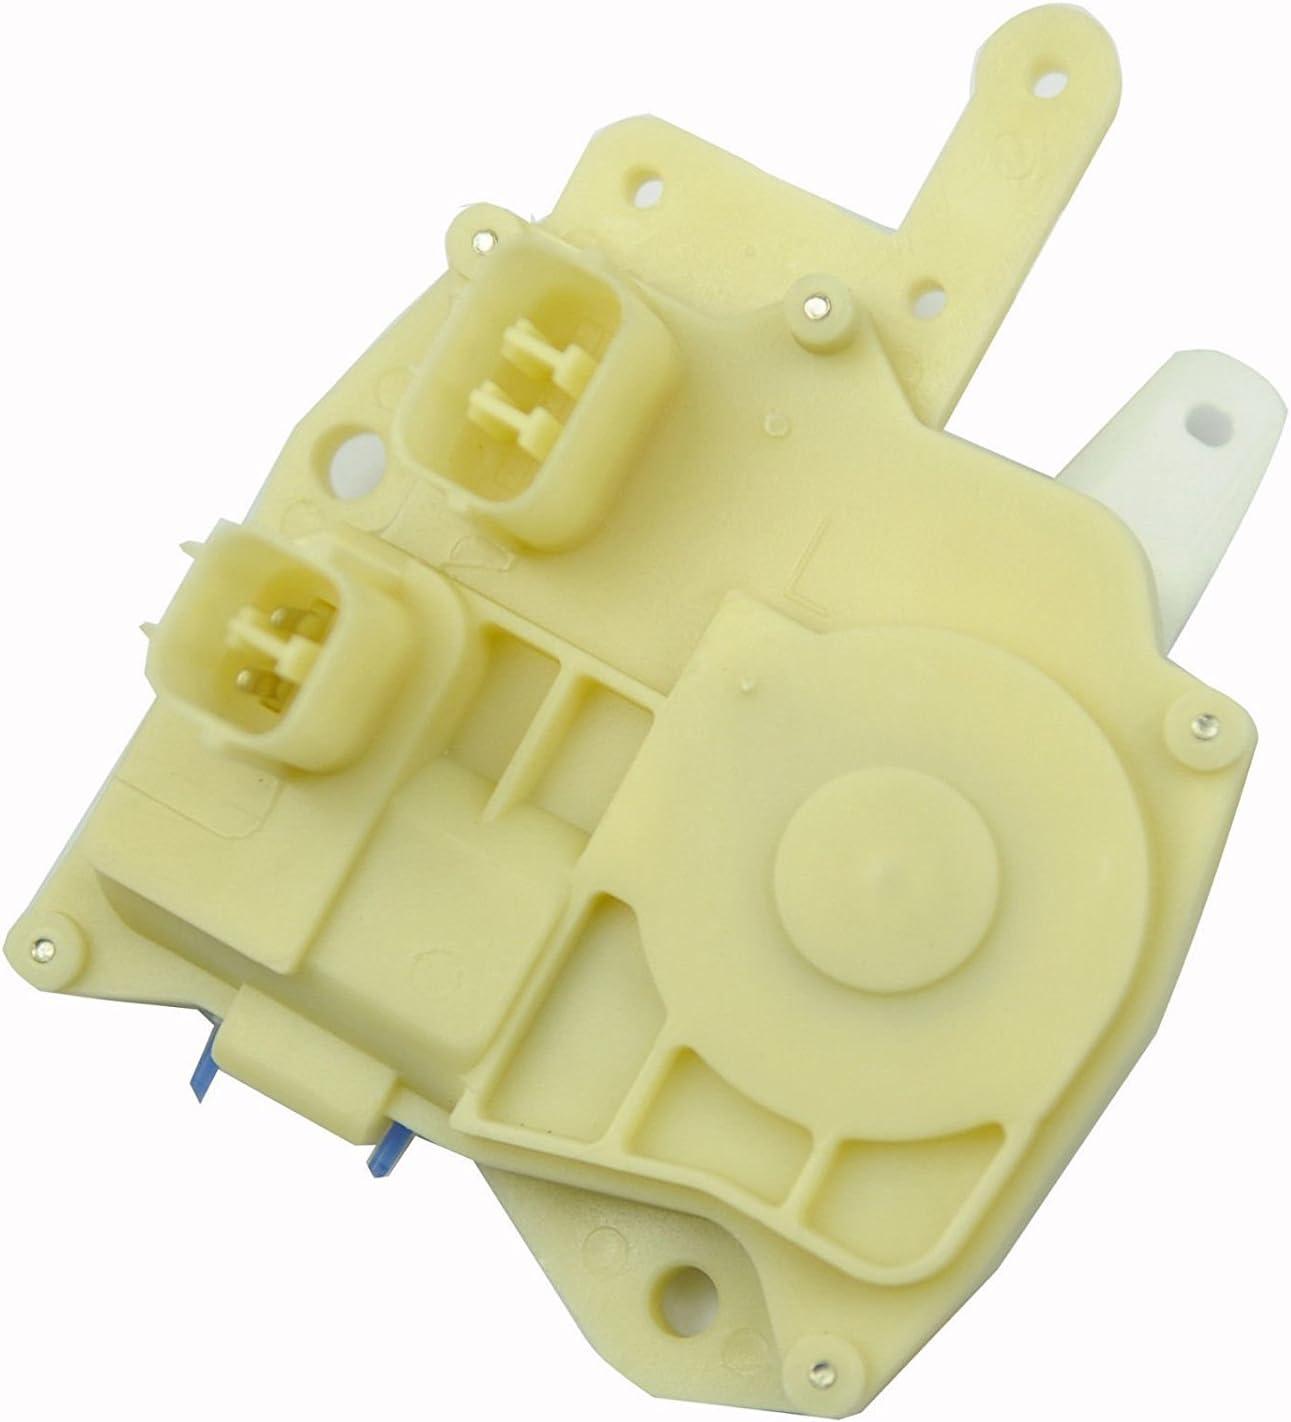 Eynpire 7120 Rear Left Driver Side Door Lock Actuator Motor For Honda Accord//Civic